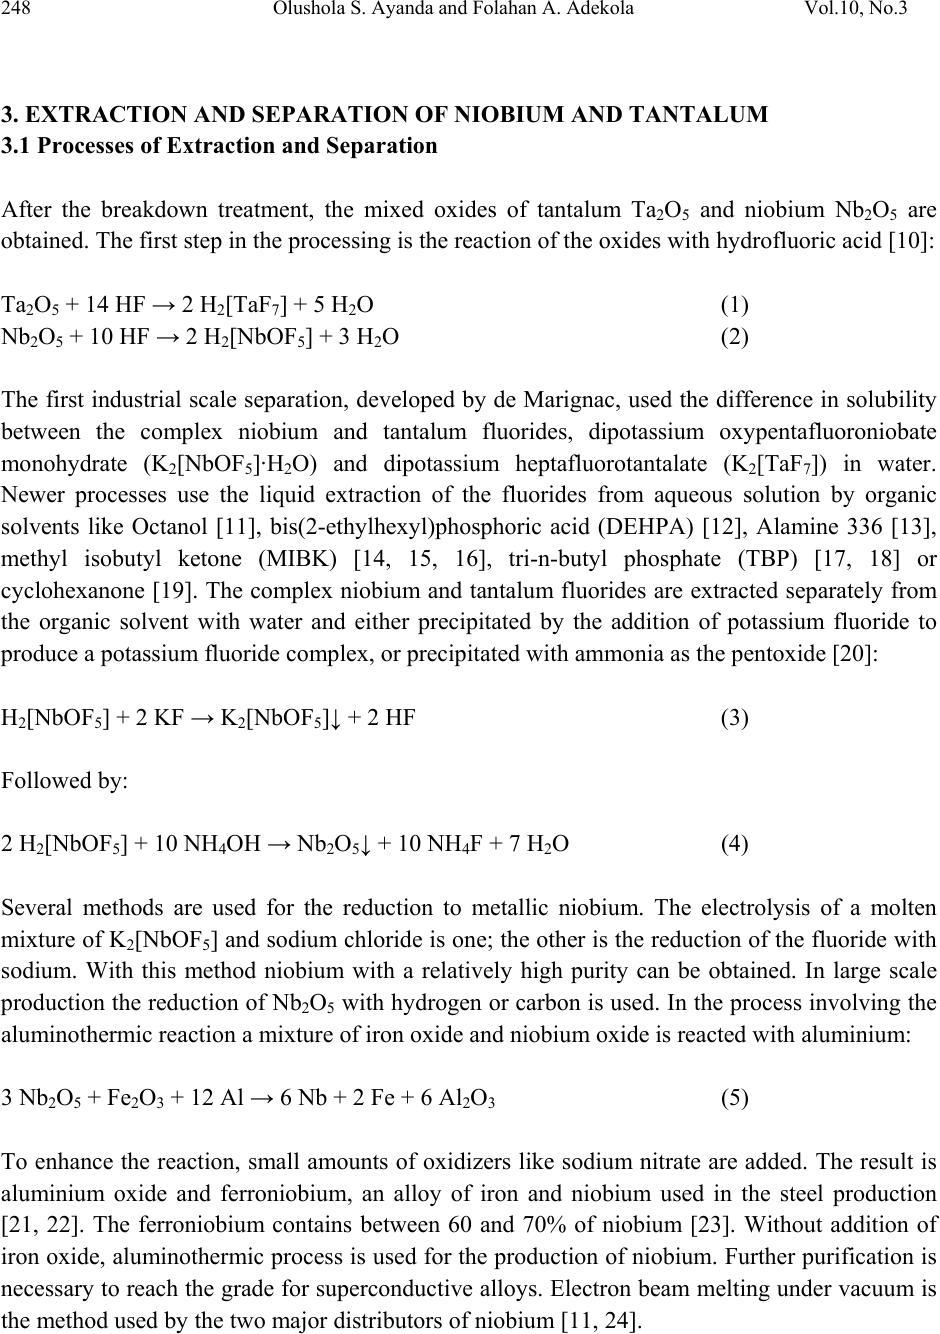 A review of niobium tantalum separation in hydrometallurgy 248 olushola s ayanda and folahan a adekola vol10 no3 biocorpaavc